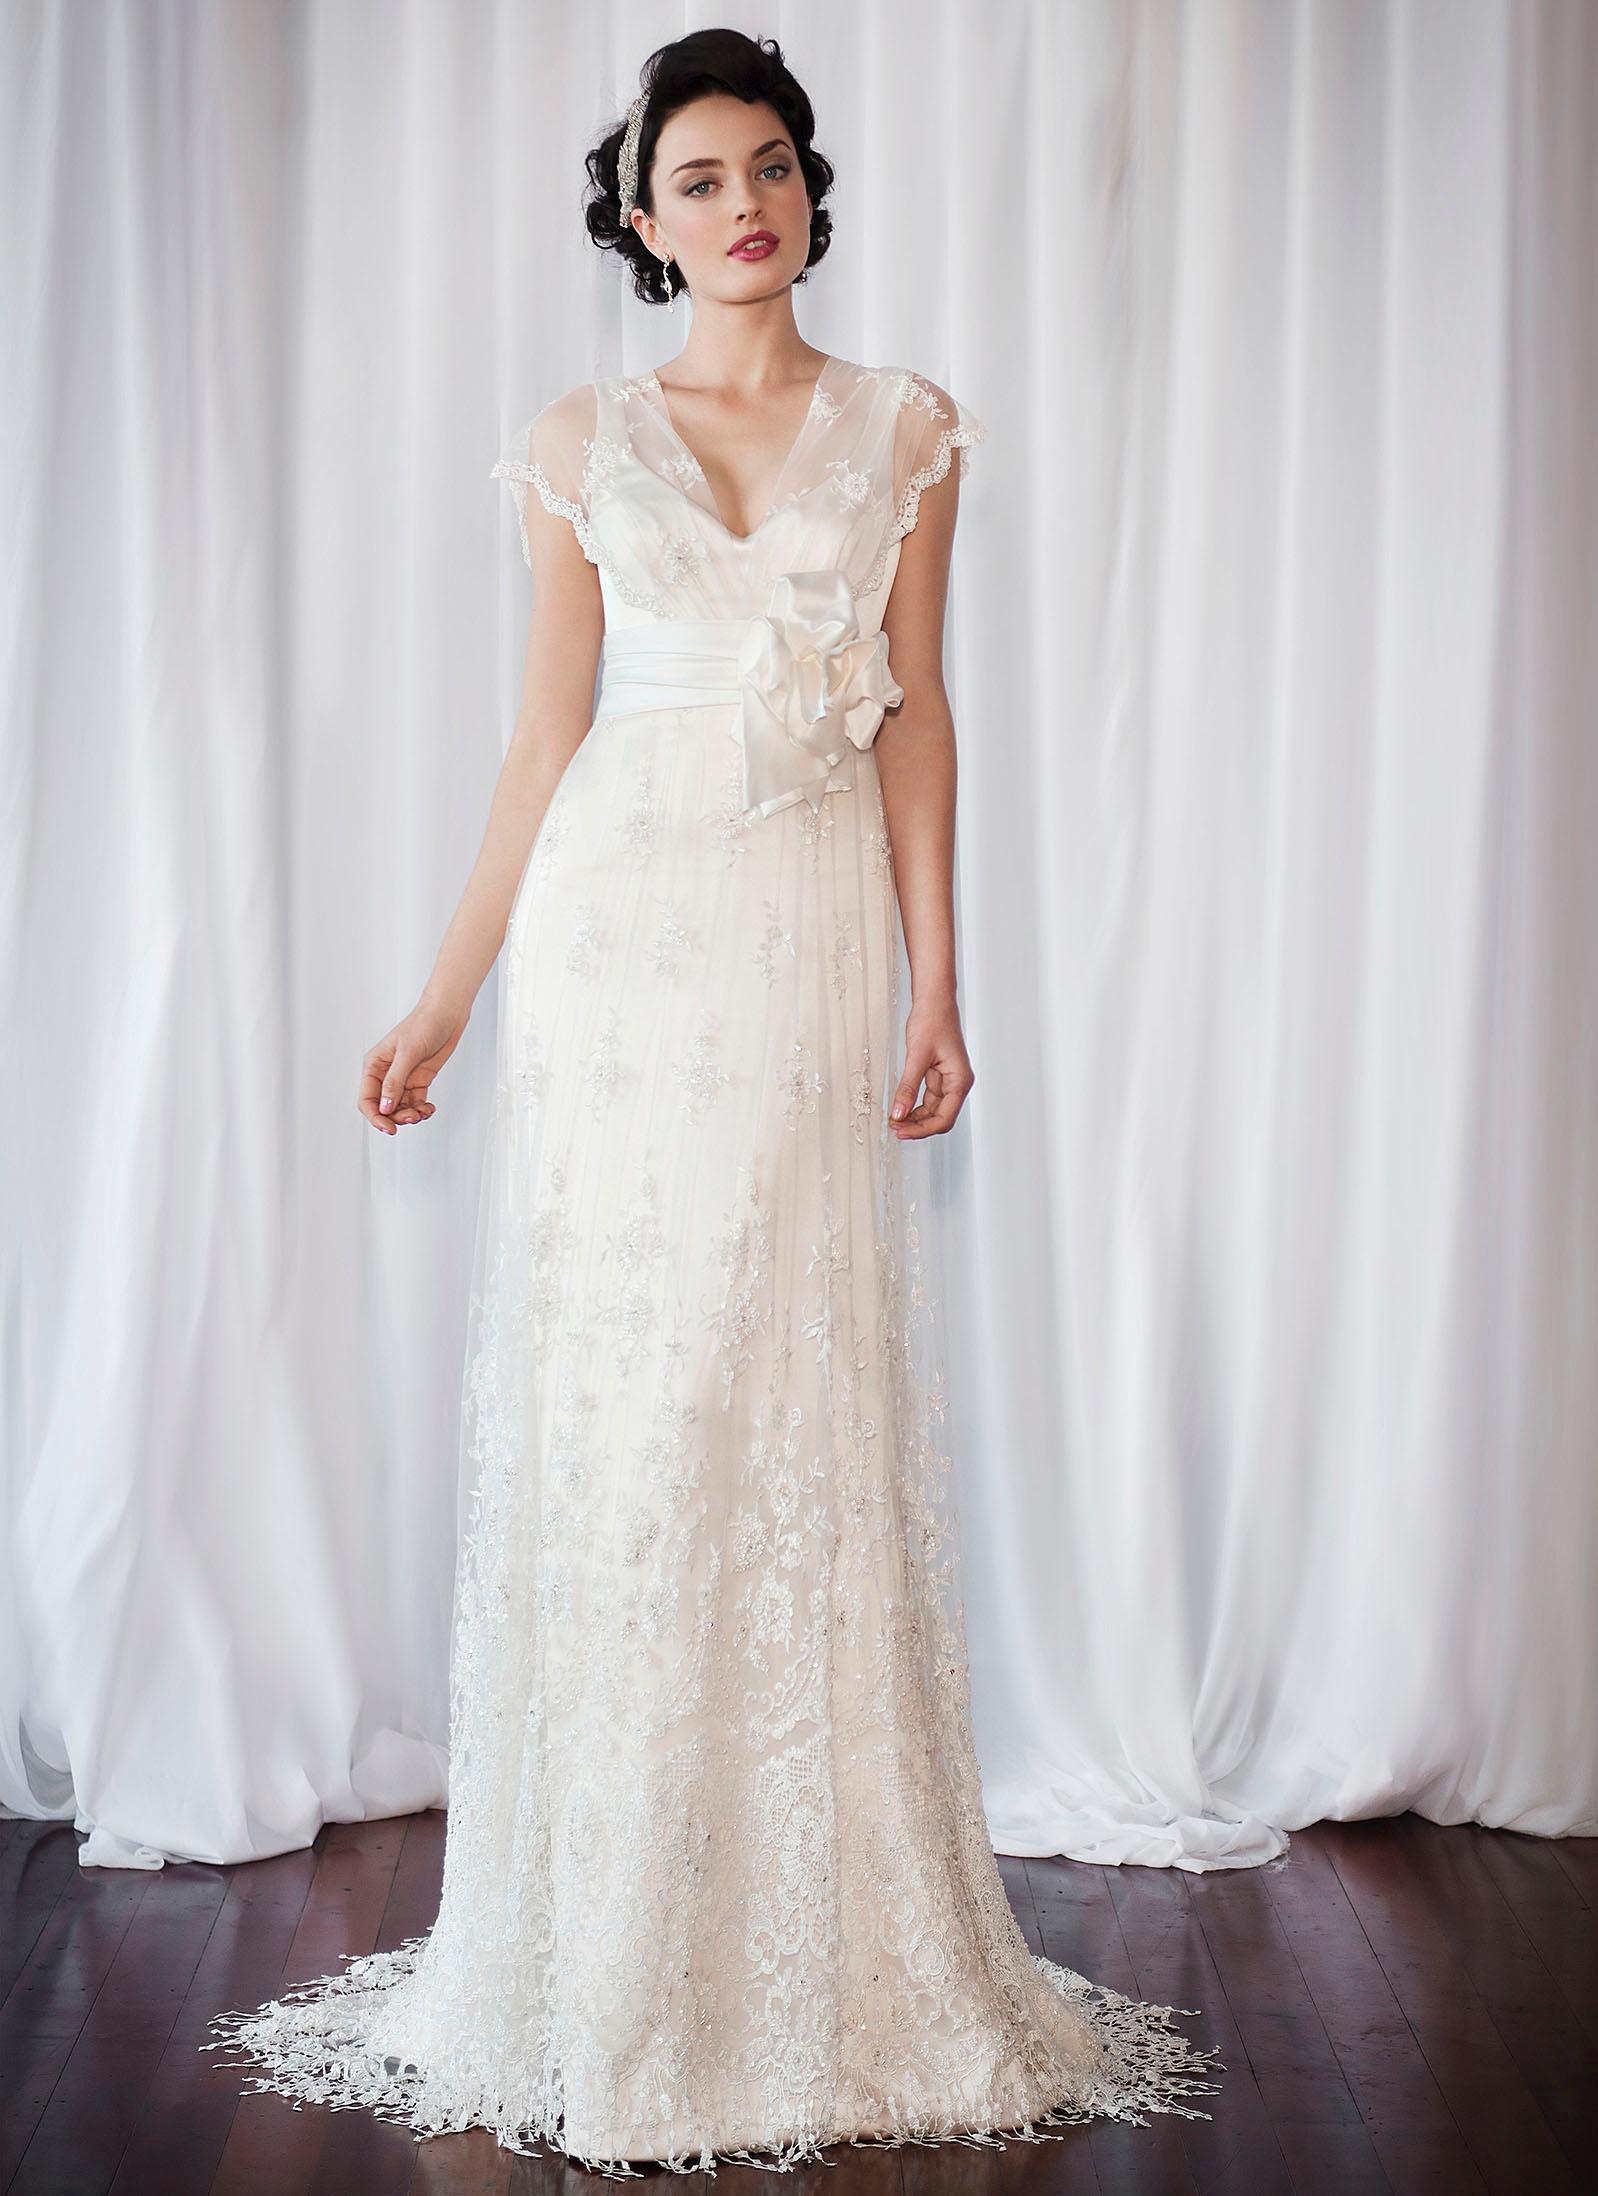 vintage-wedding-dress-1.jpg